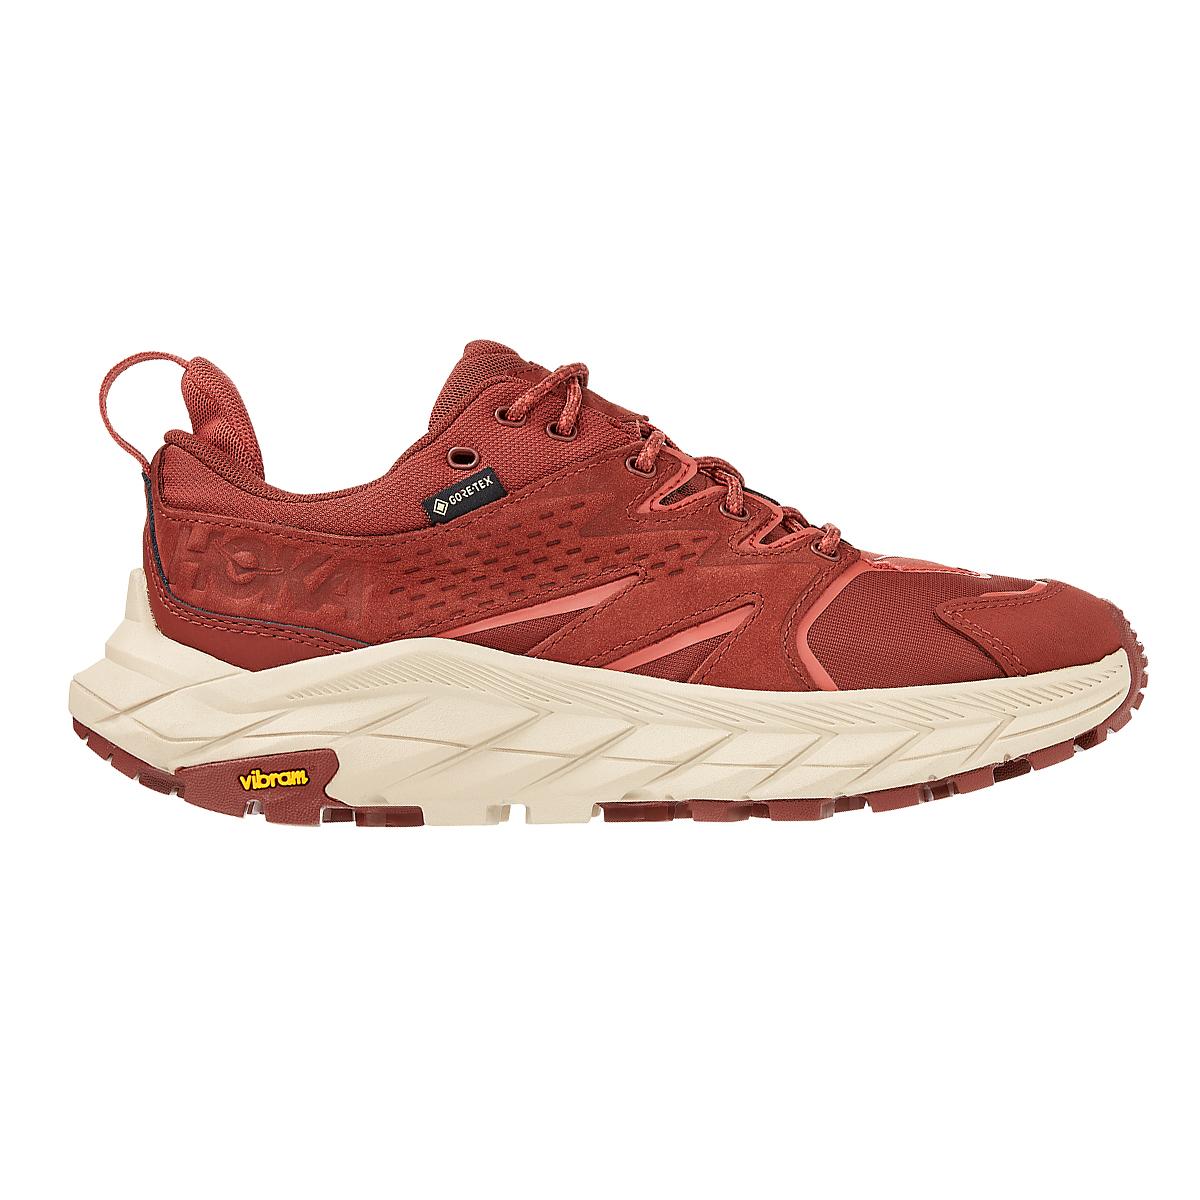 Women's Hoka One One Anacapa Low Gore-Tex Trail Running Shoe - Color: Cherry Mahogany - Size: 5 - Width: Regular, Cherry Mahogany, large, image 1